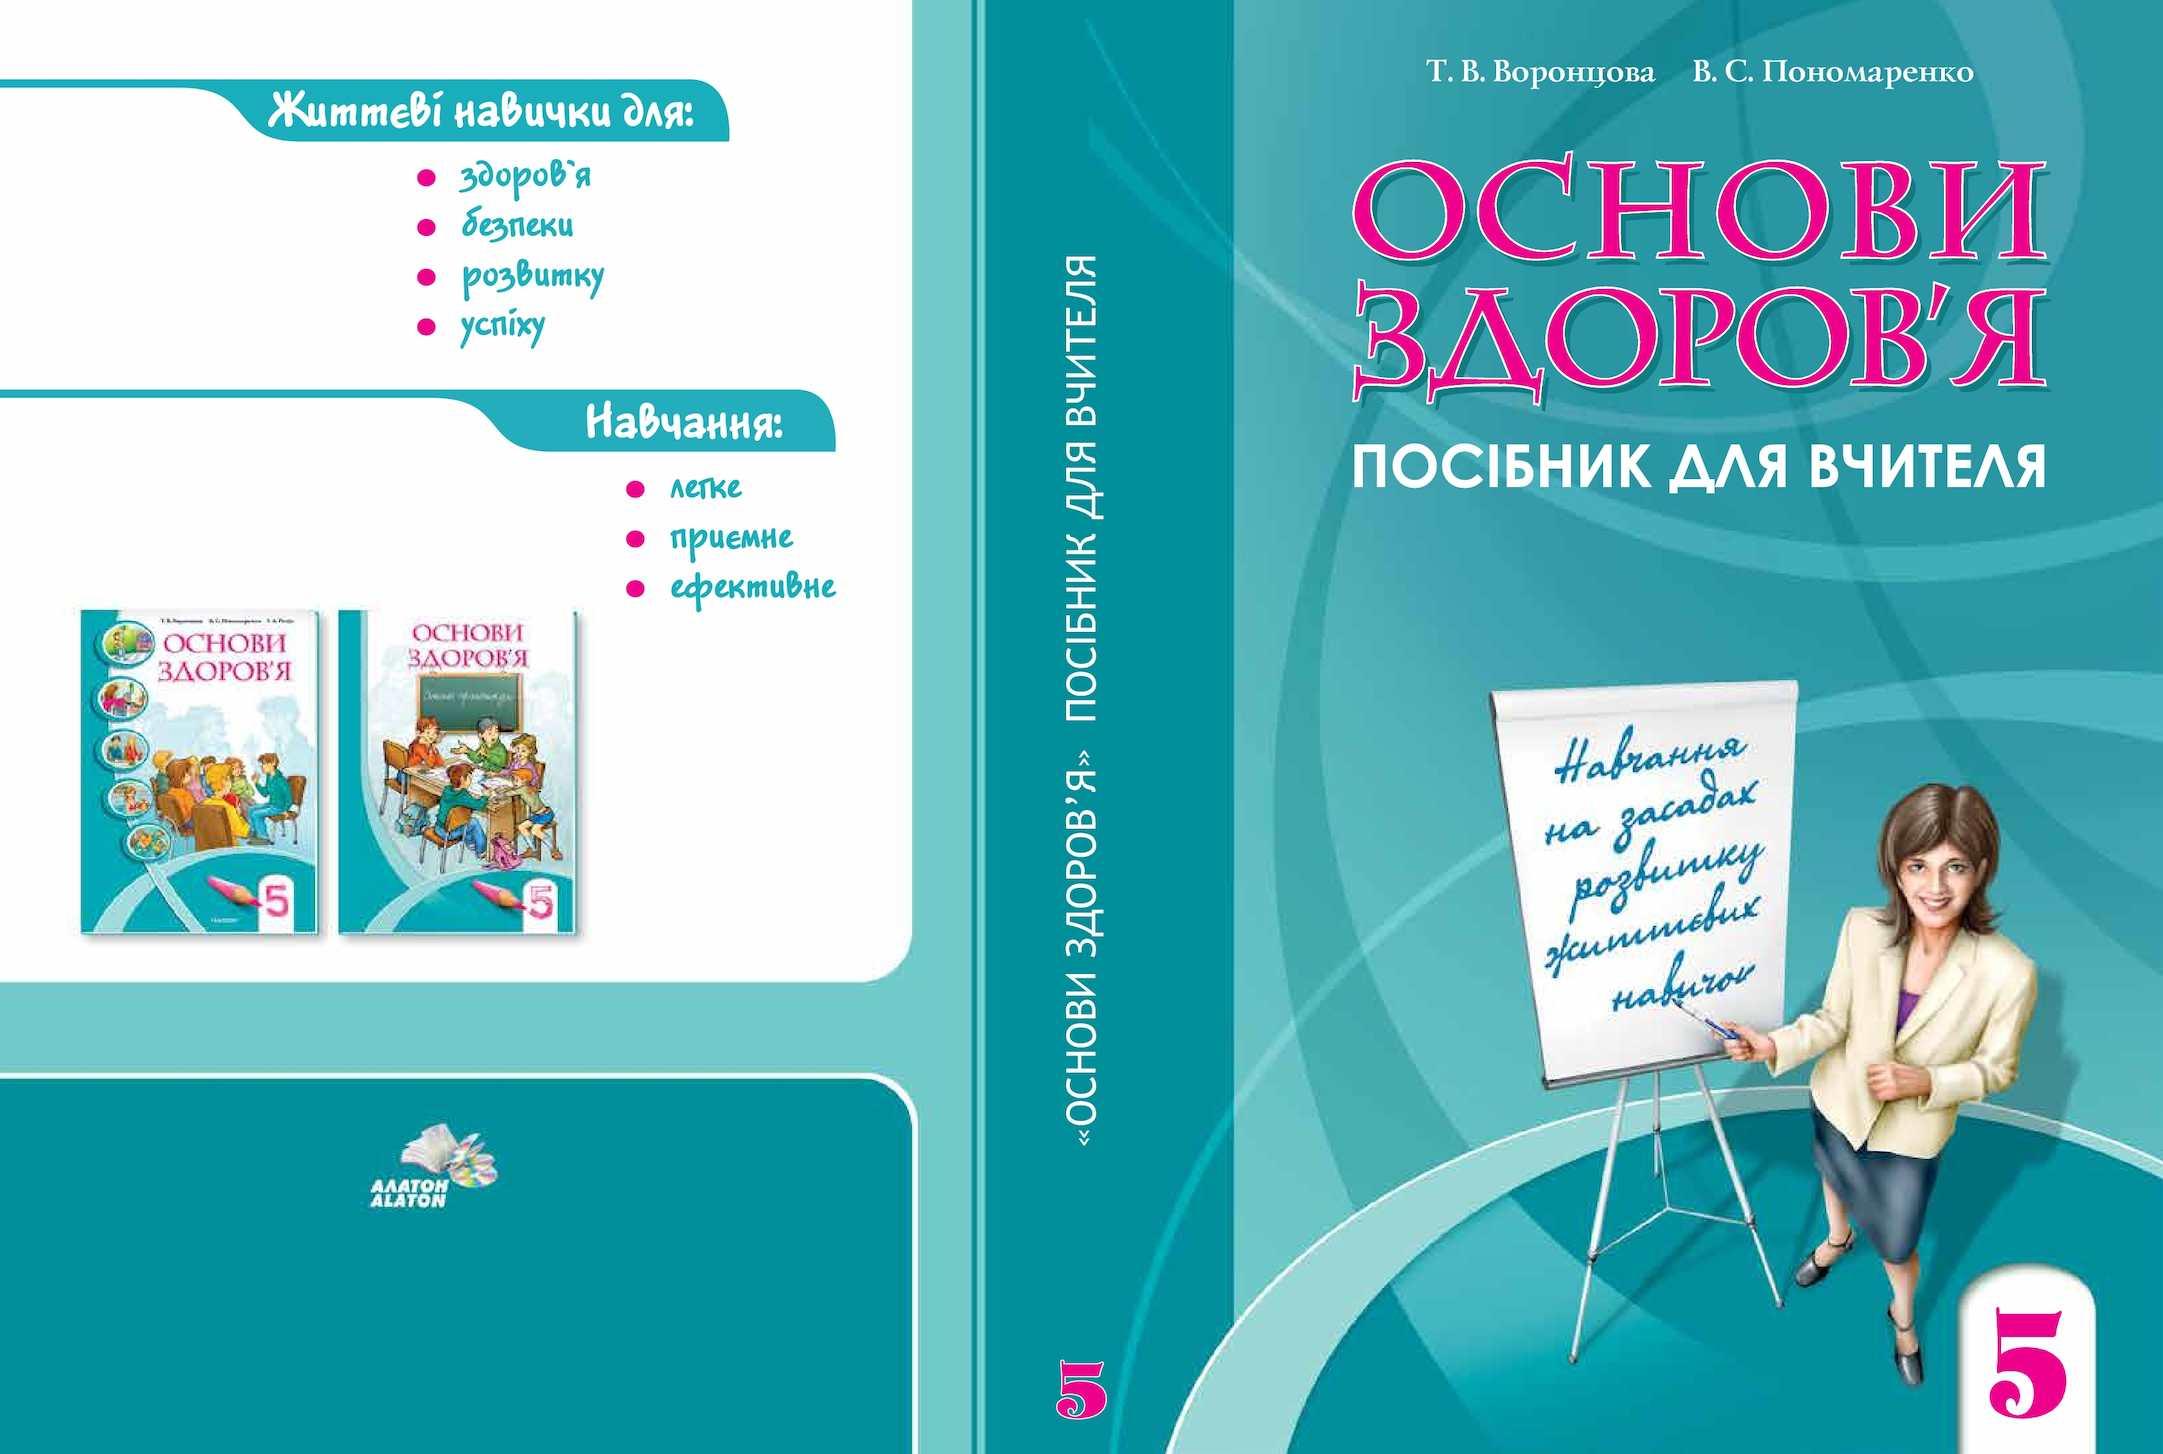 Calaméo - Основи здоров я Посібник для вчителя 5 Воронцова. a378ec188645f